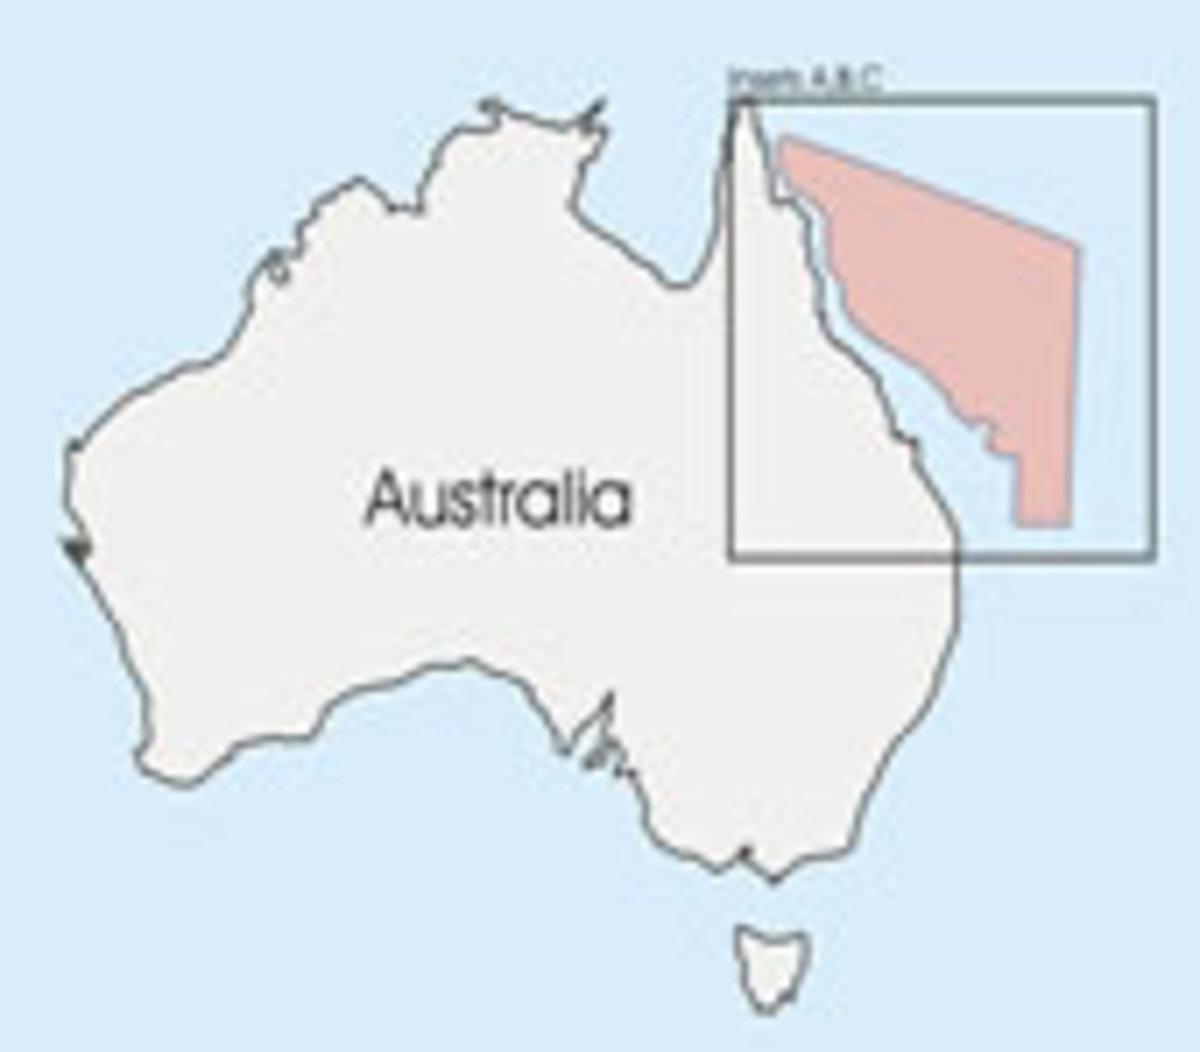 Area of the Coral Sea islands off the Queensland coast